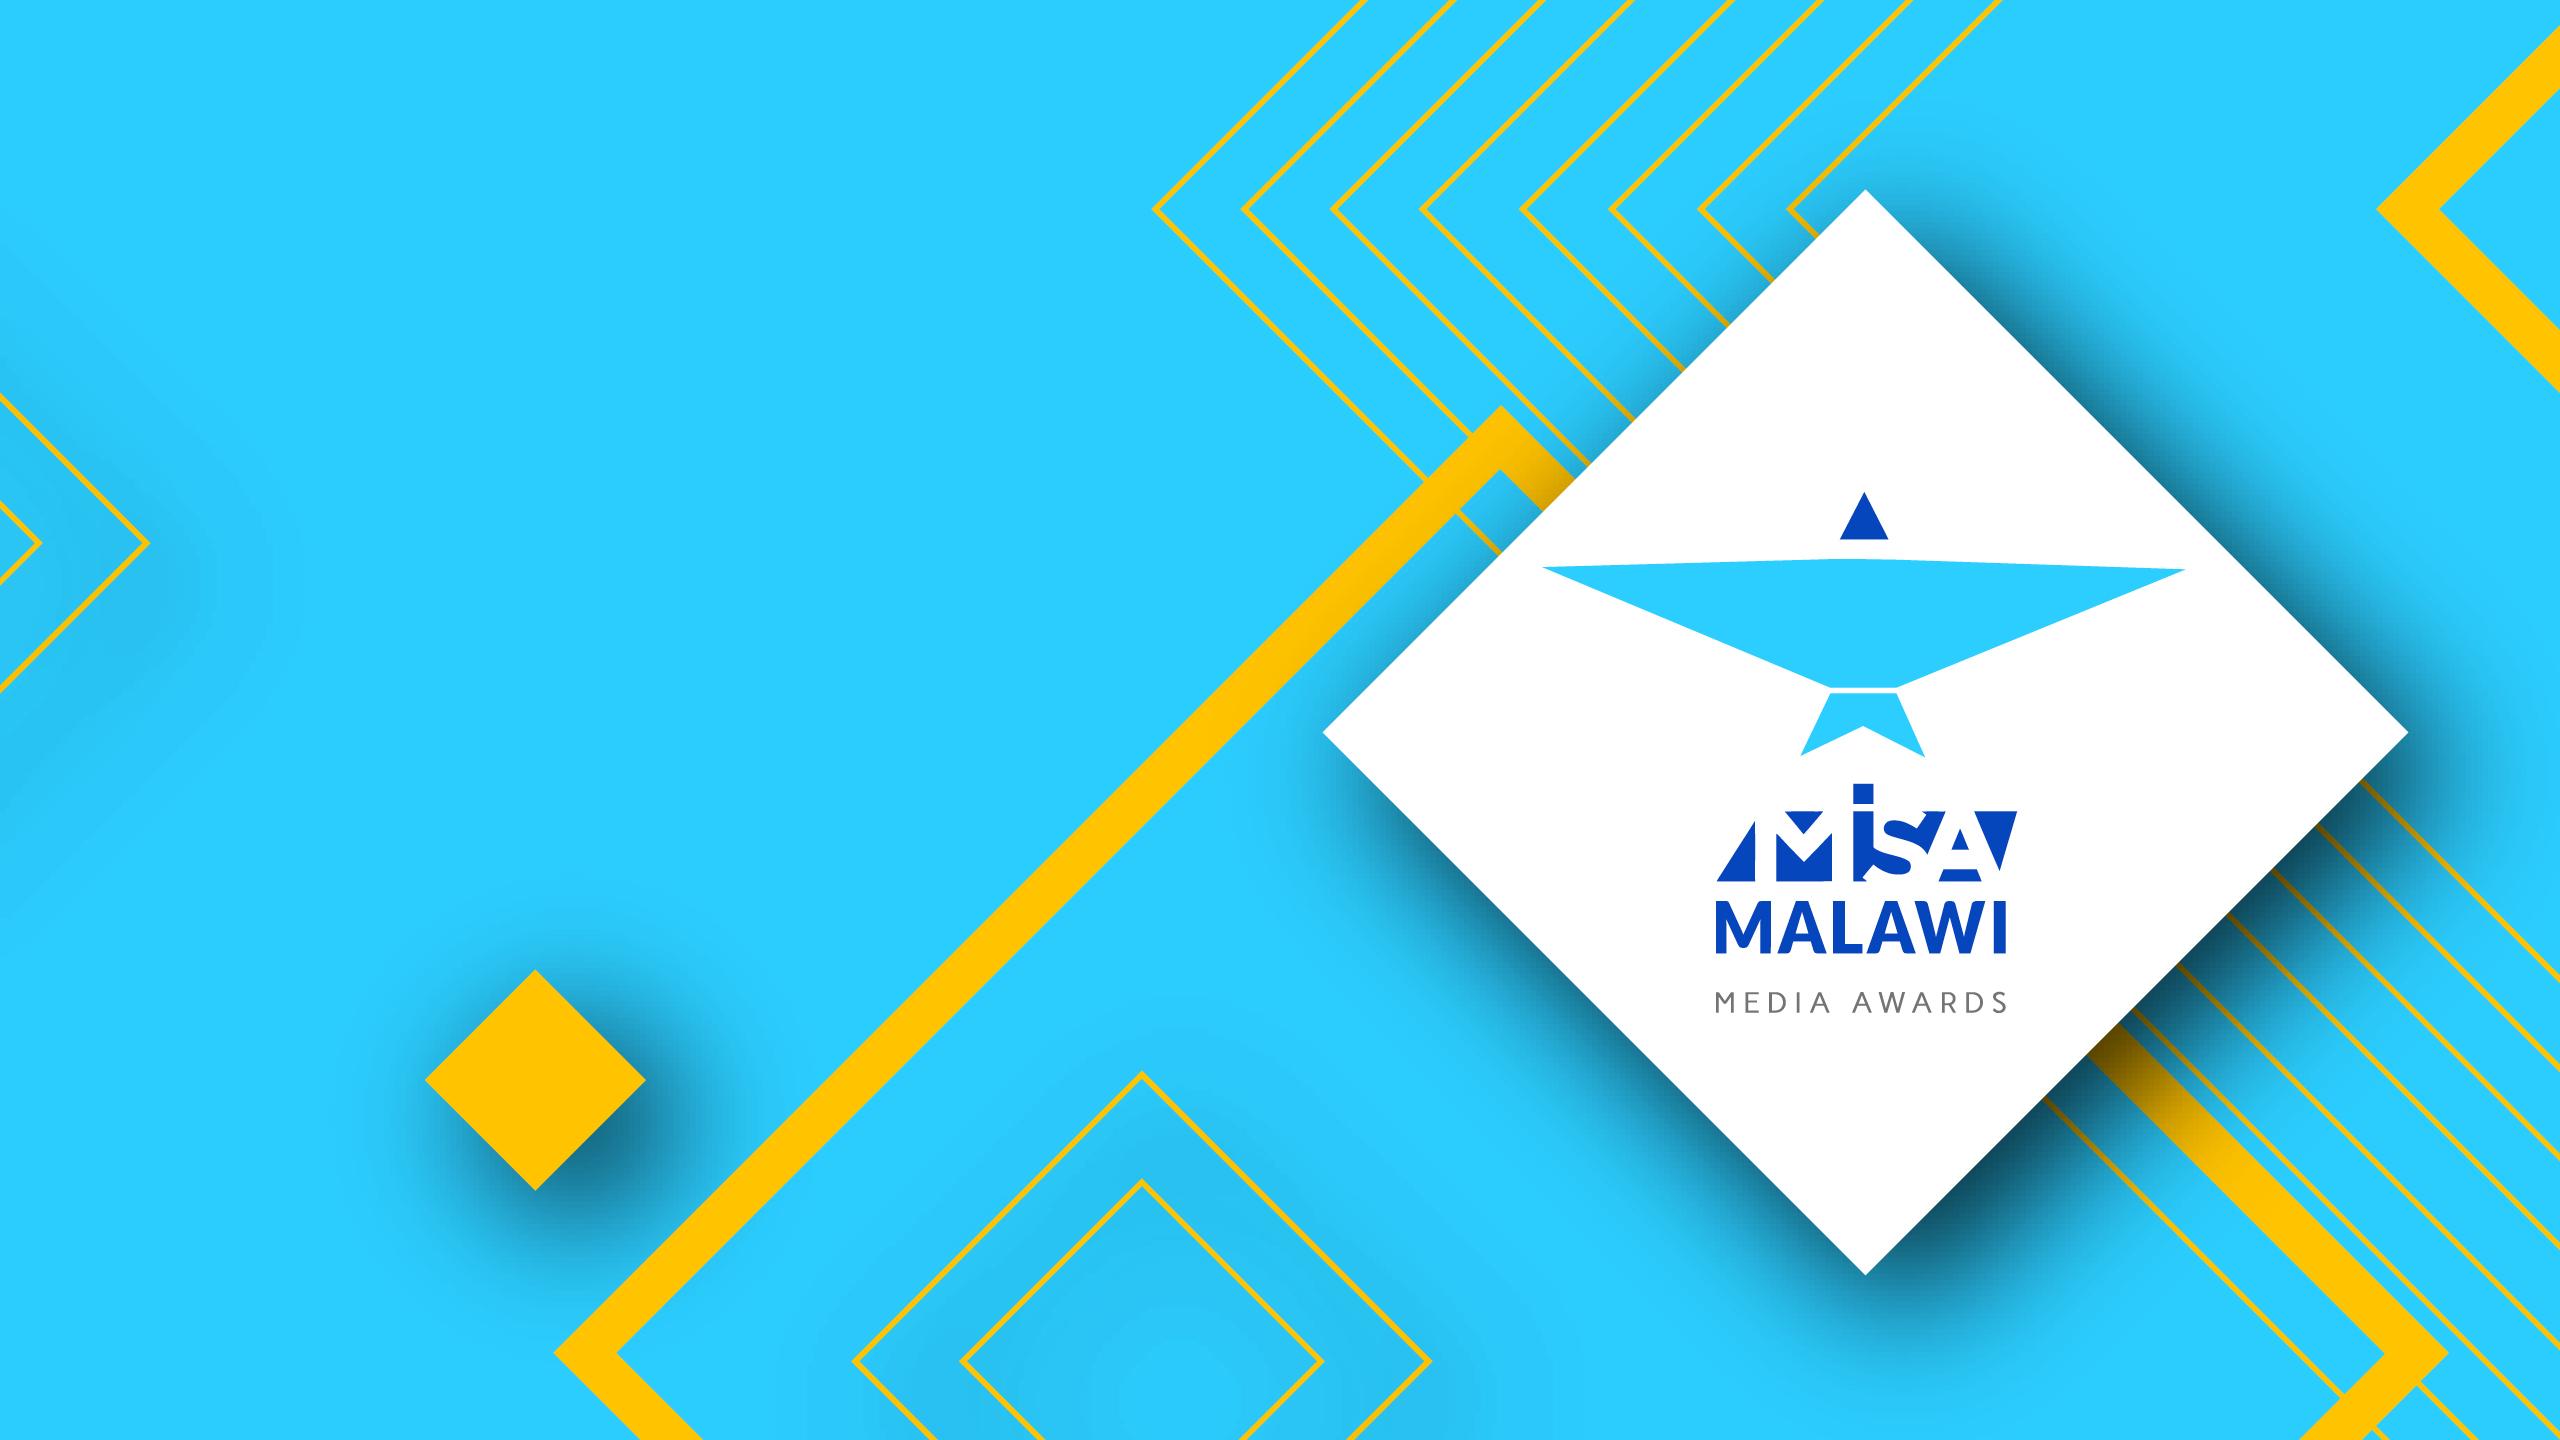 MISA Malawi media awards logo